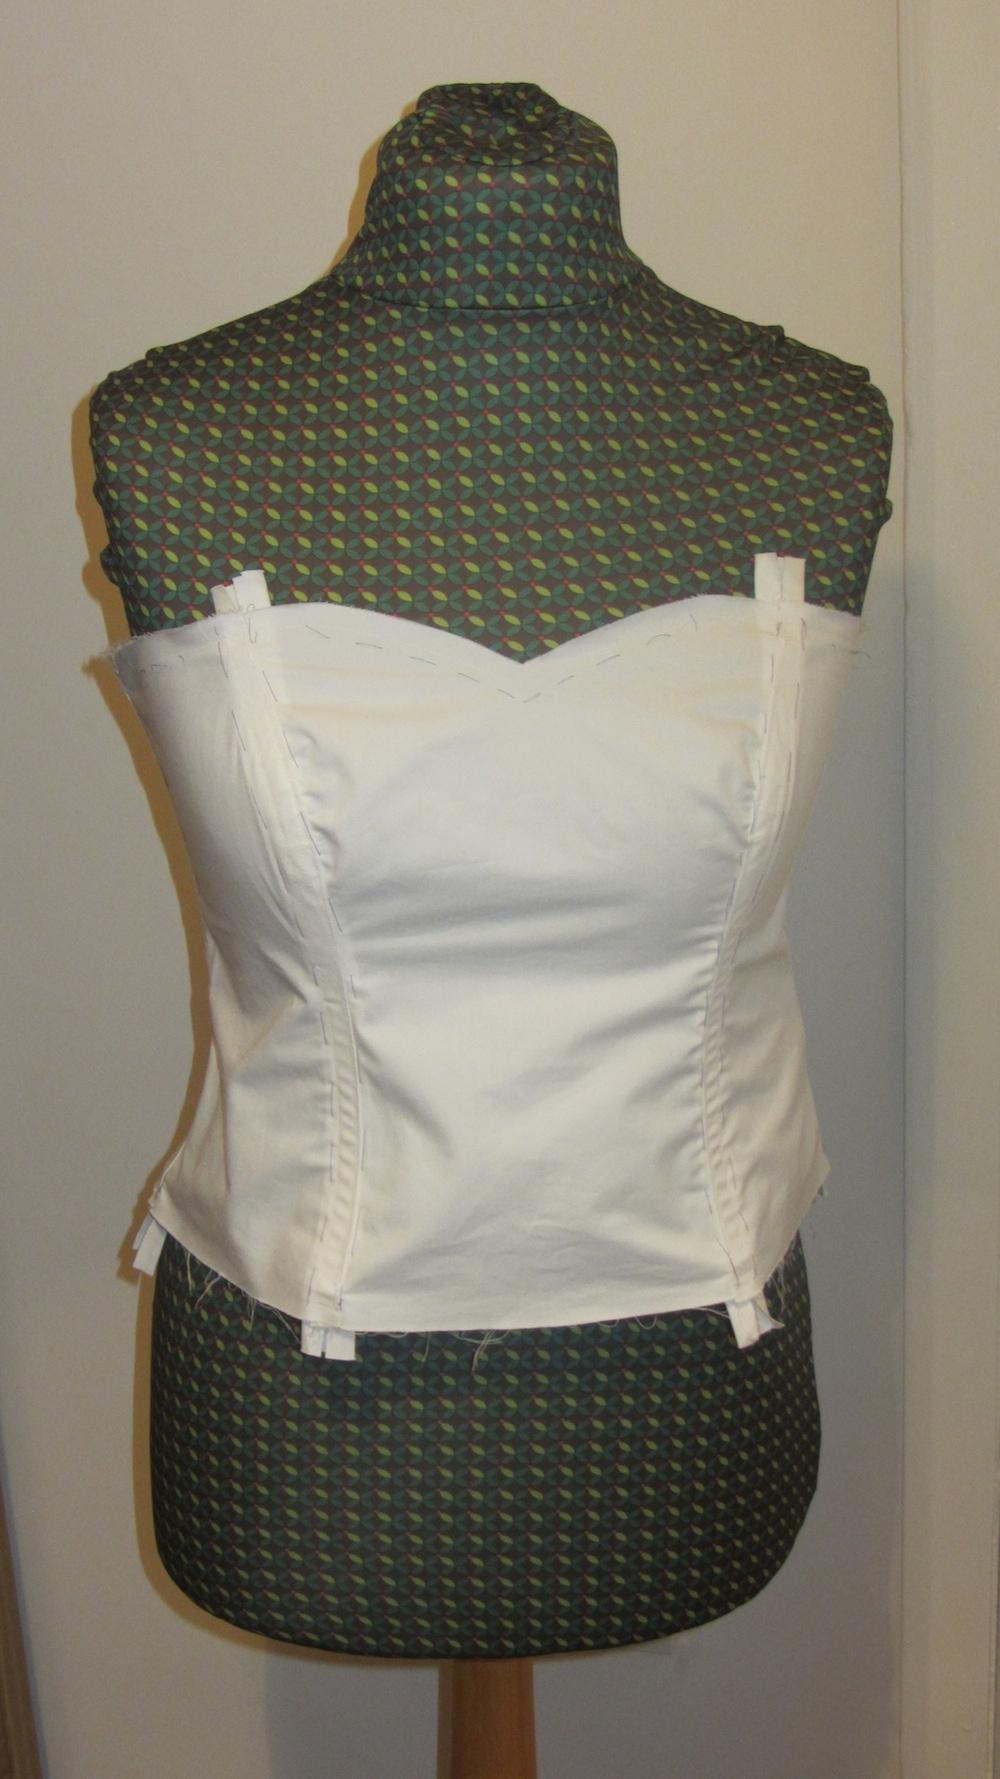 Handmade wedding dress cotton twill bodice with boning 4.jpg